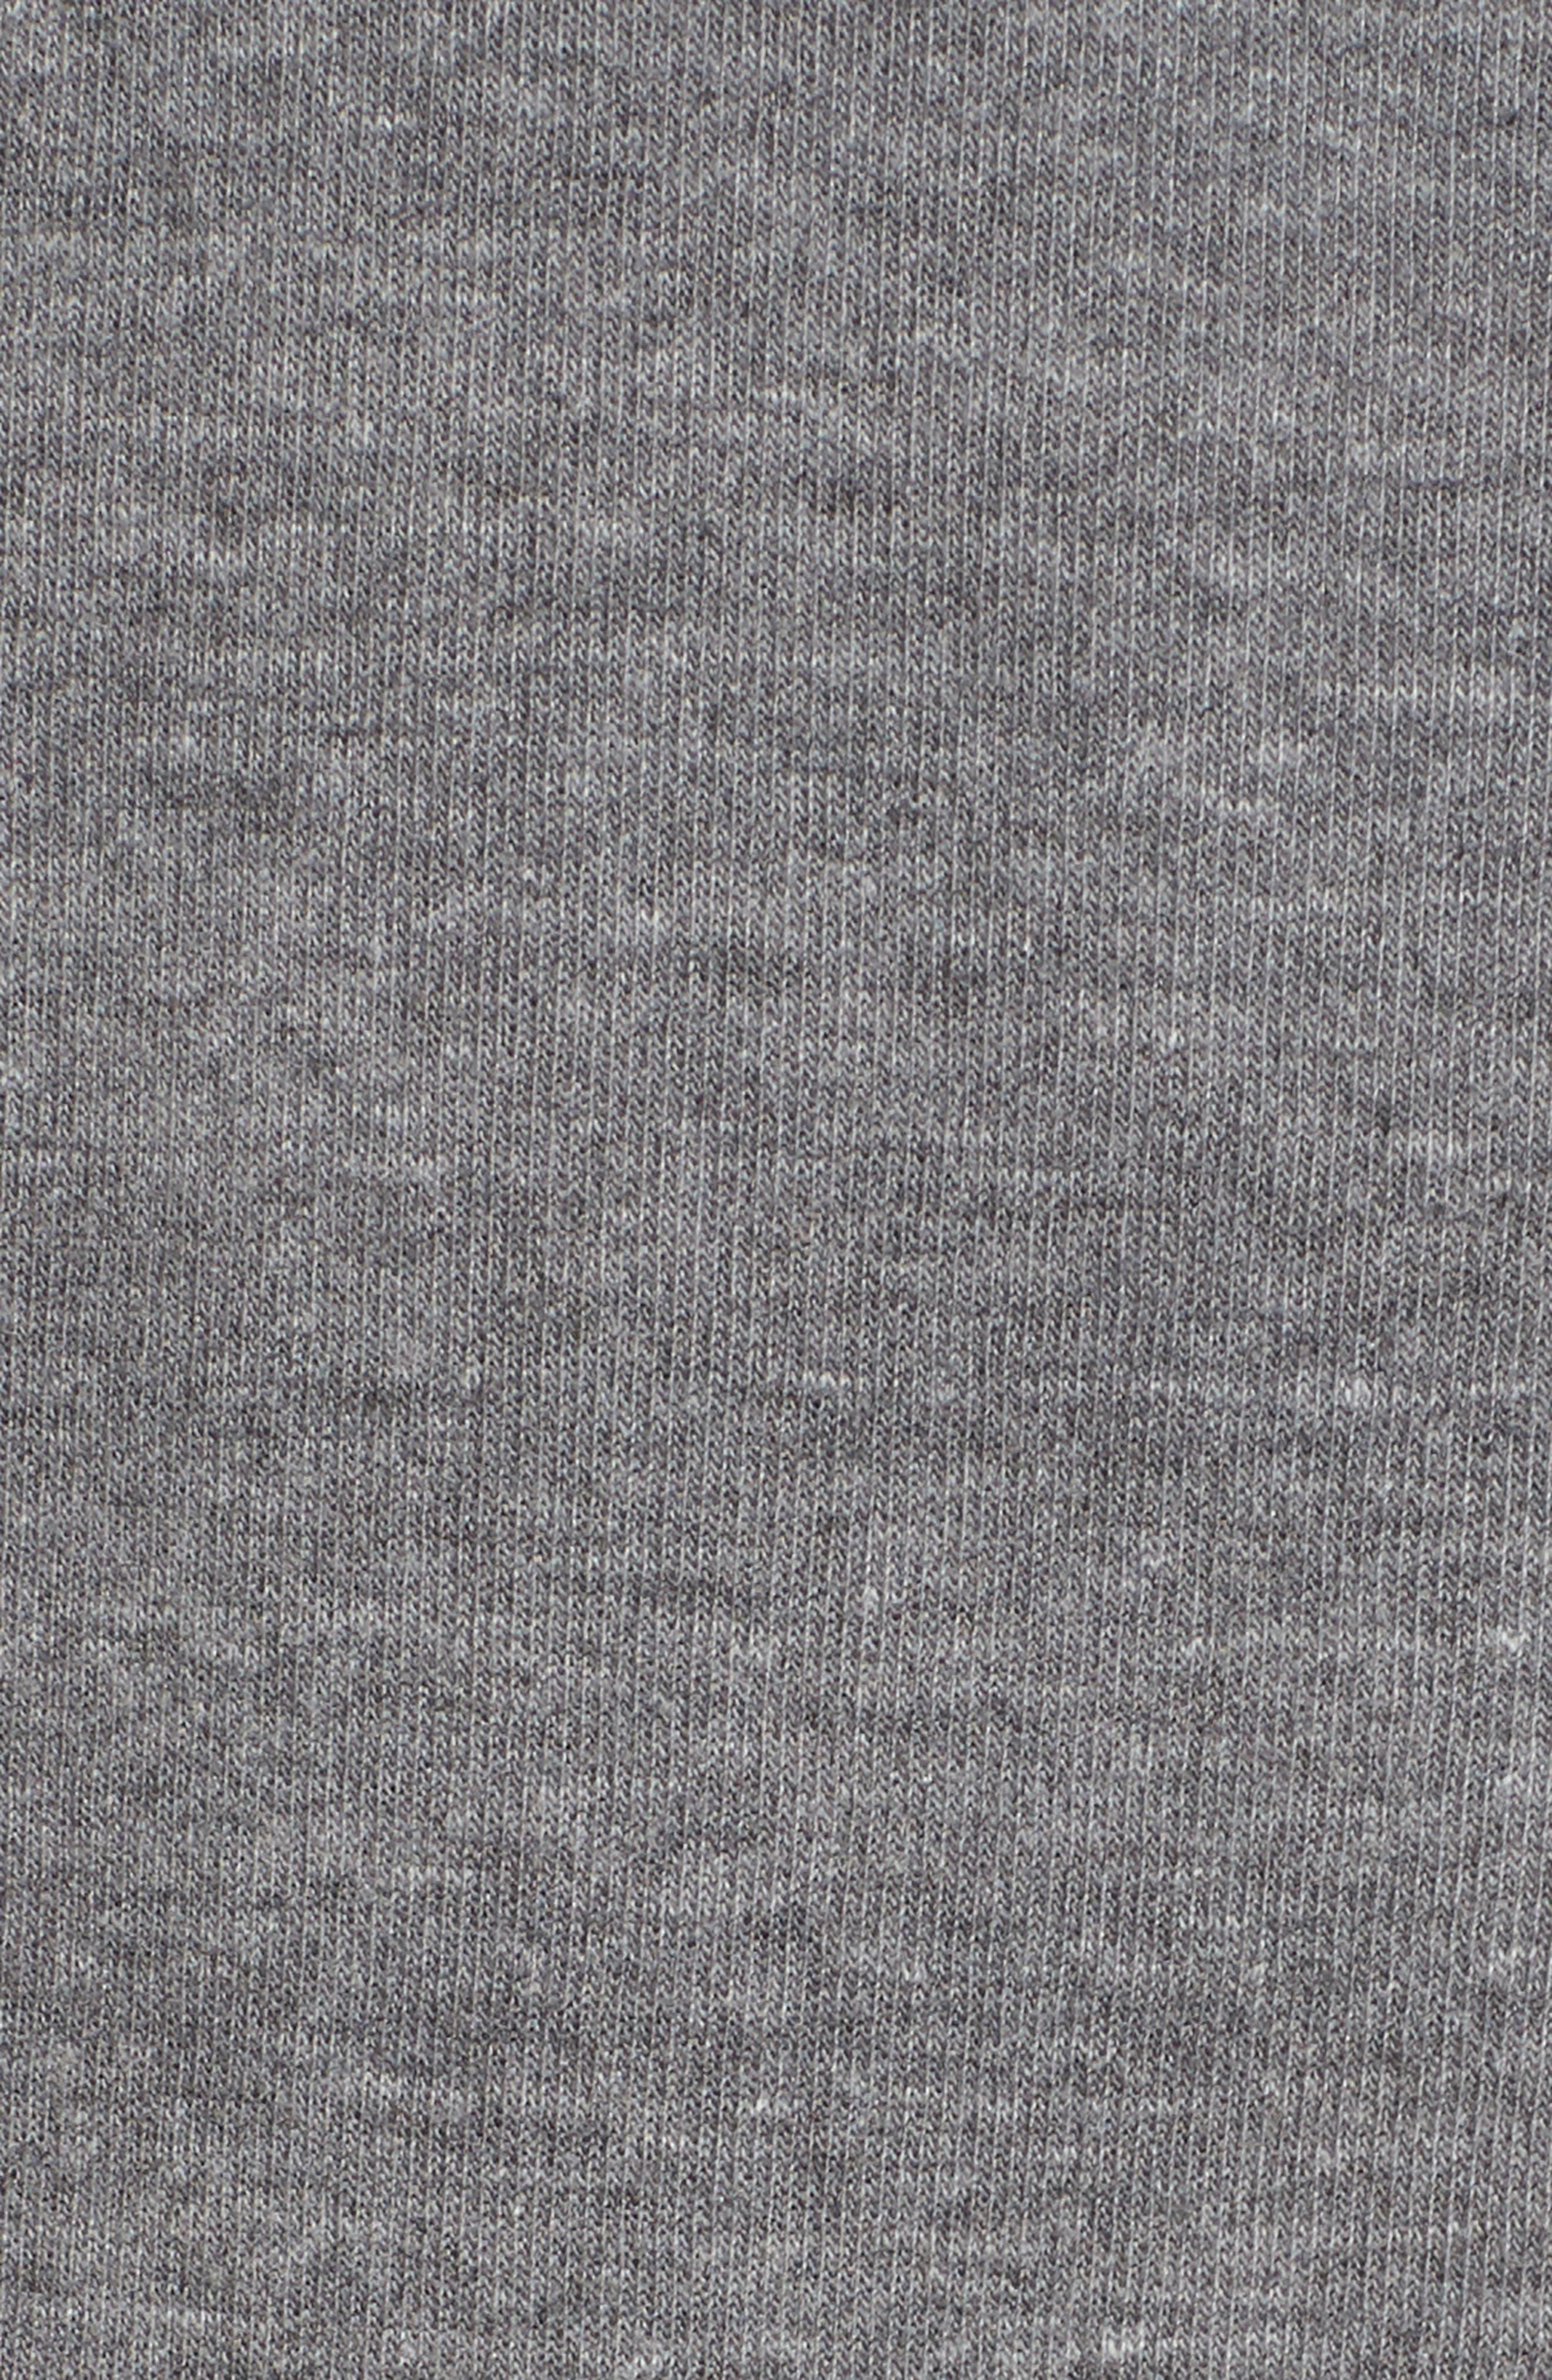 5-Stripe Zip Hoodie,                             Alternate thumbnail 6, color,                             HEATHER GREY/ BLUE STRIPES